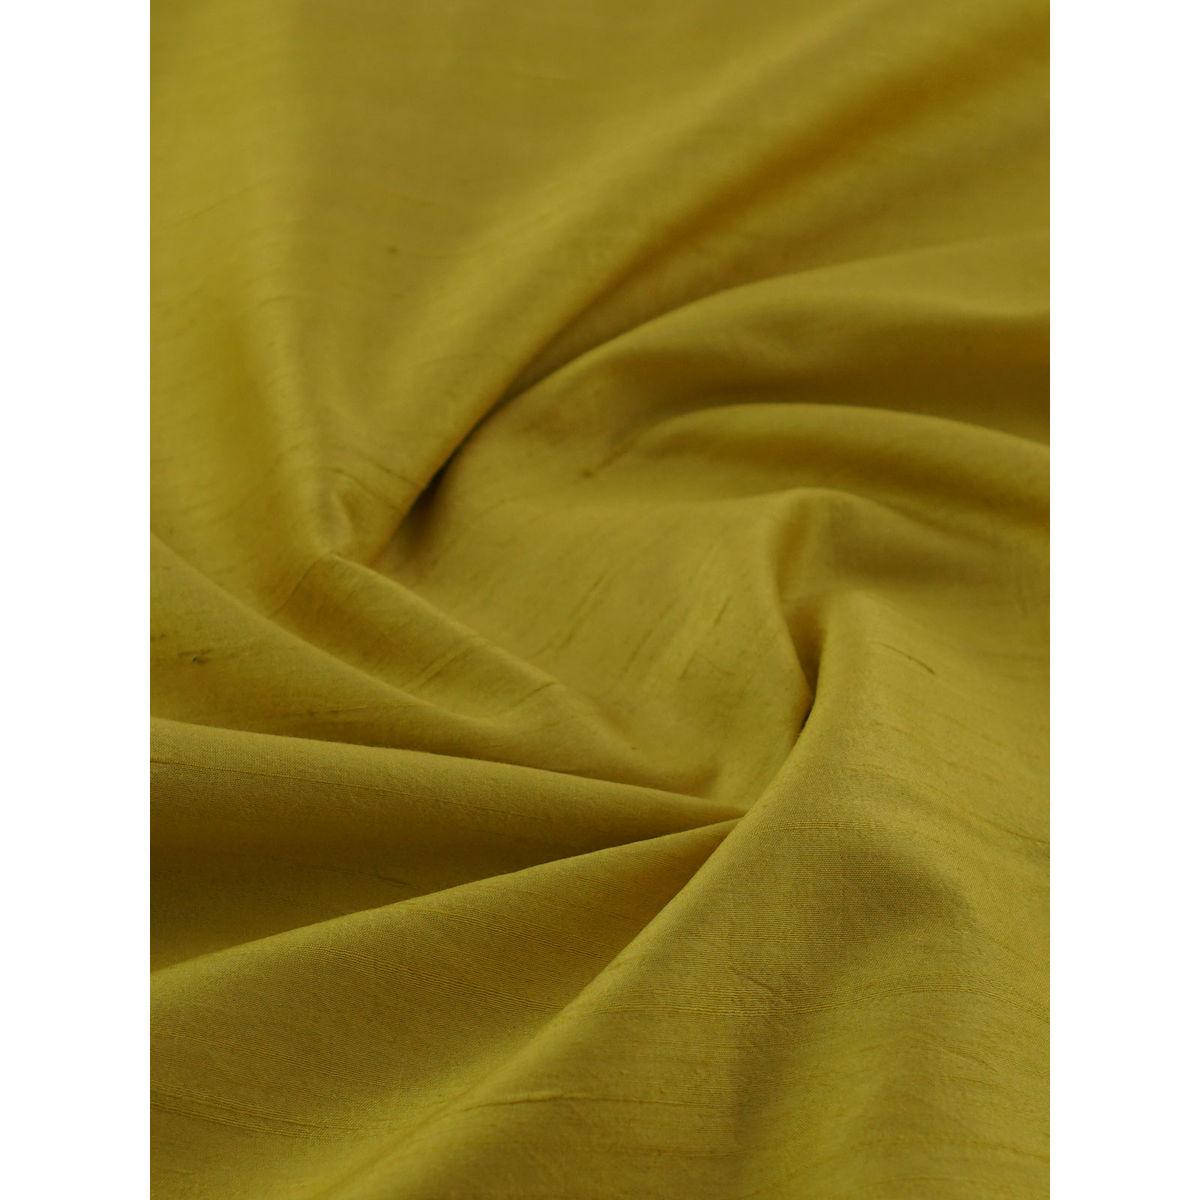 671d539f36be6 Yellow pure raw silk fabric